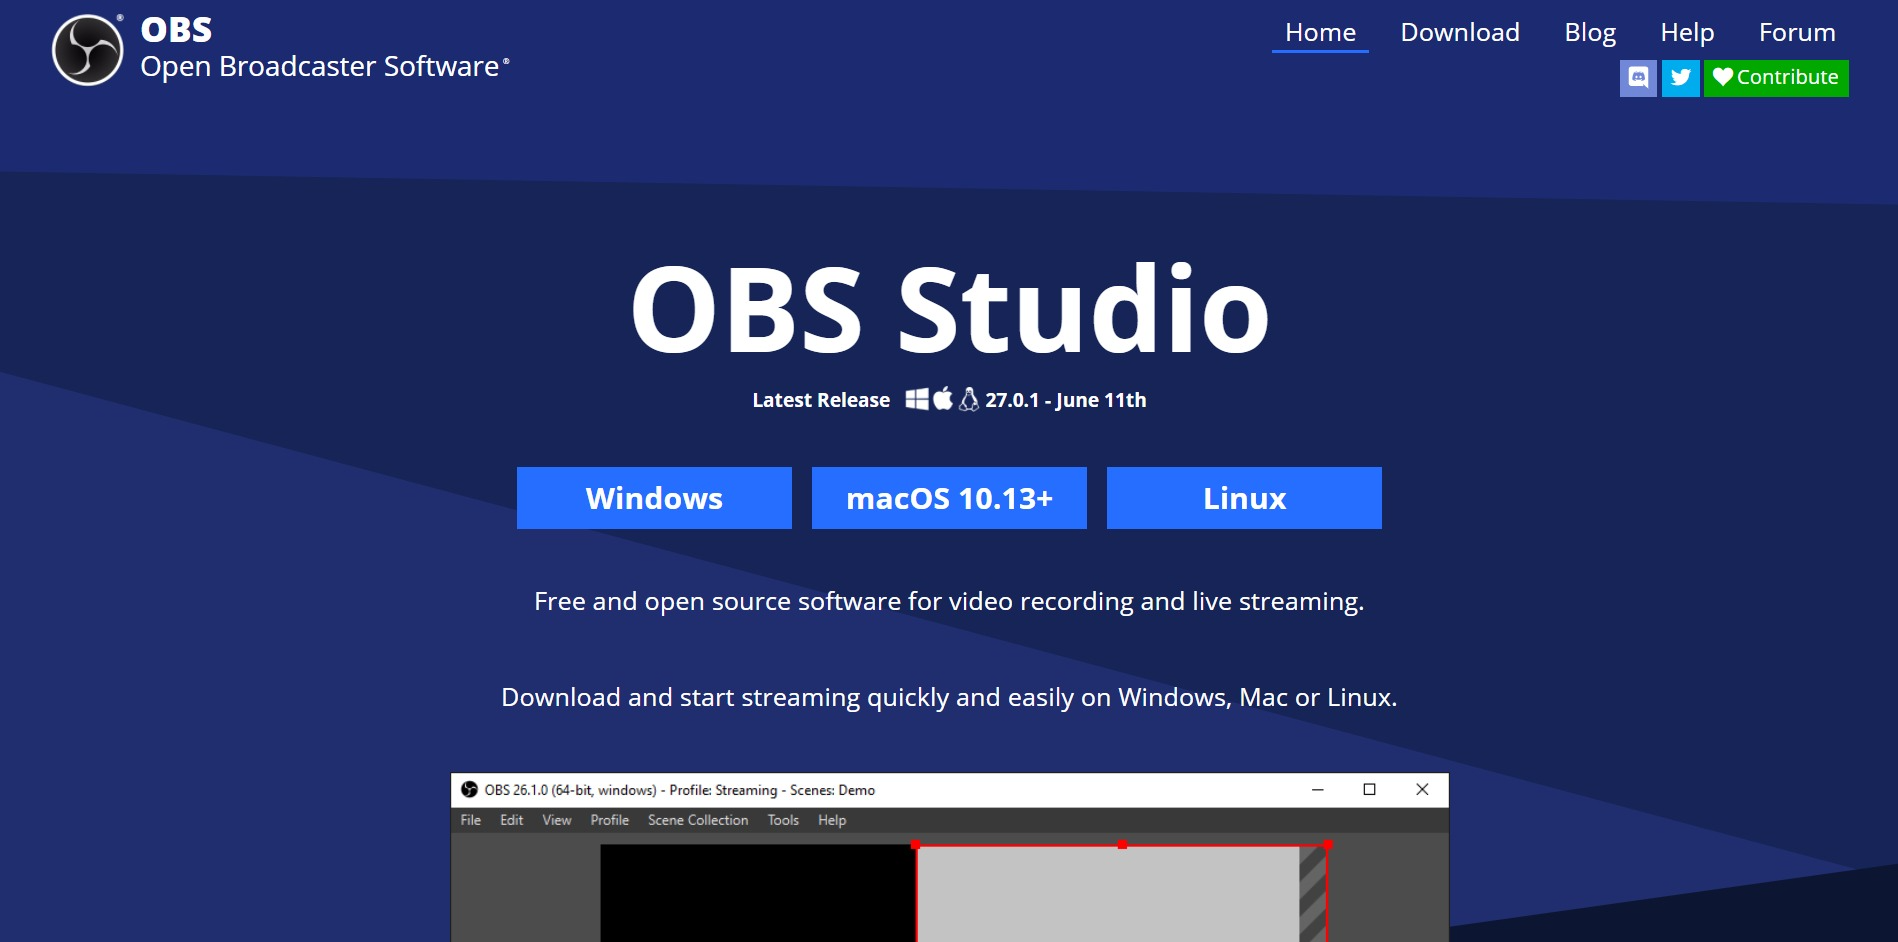 OBS Studio - Main Page